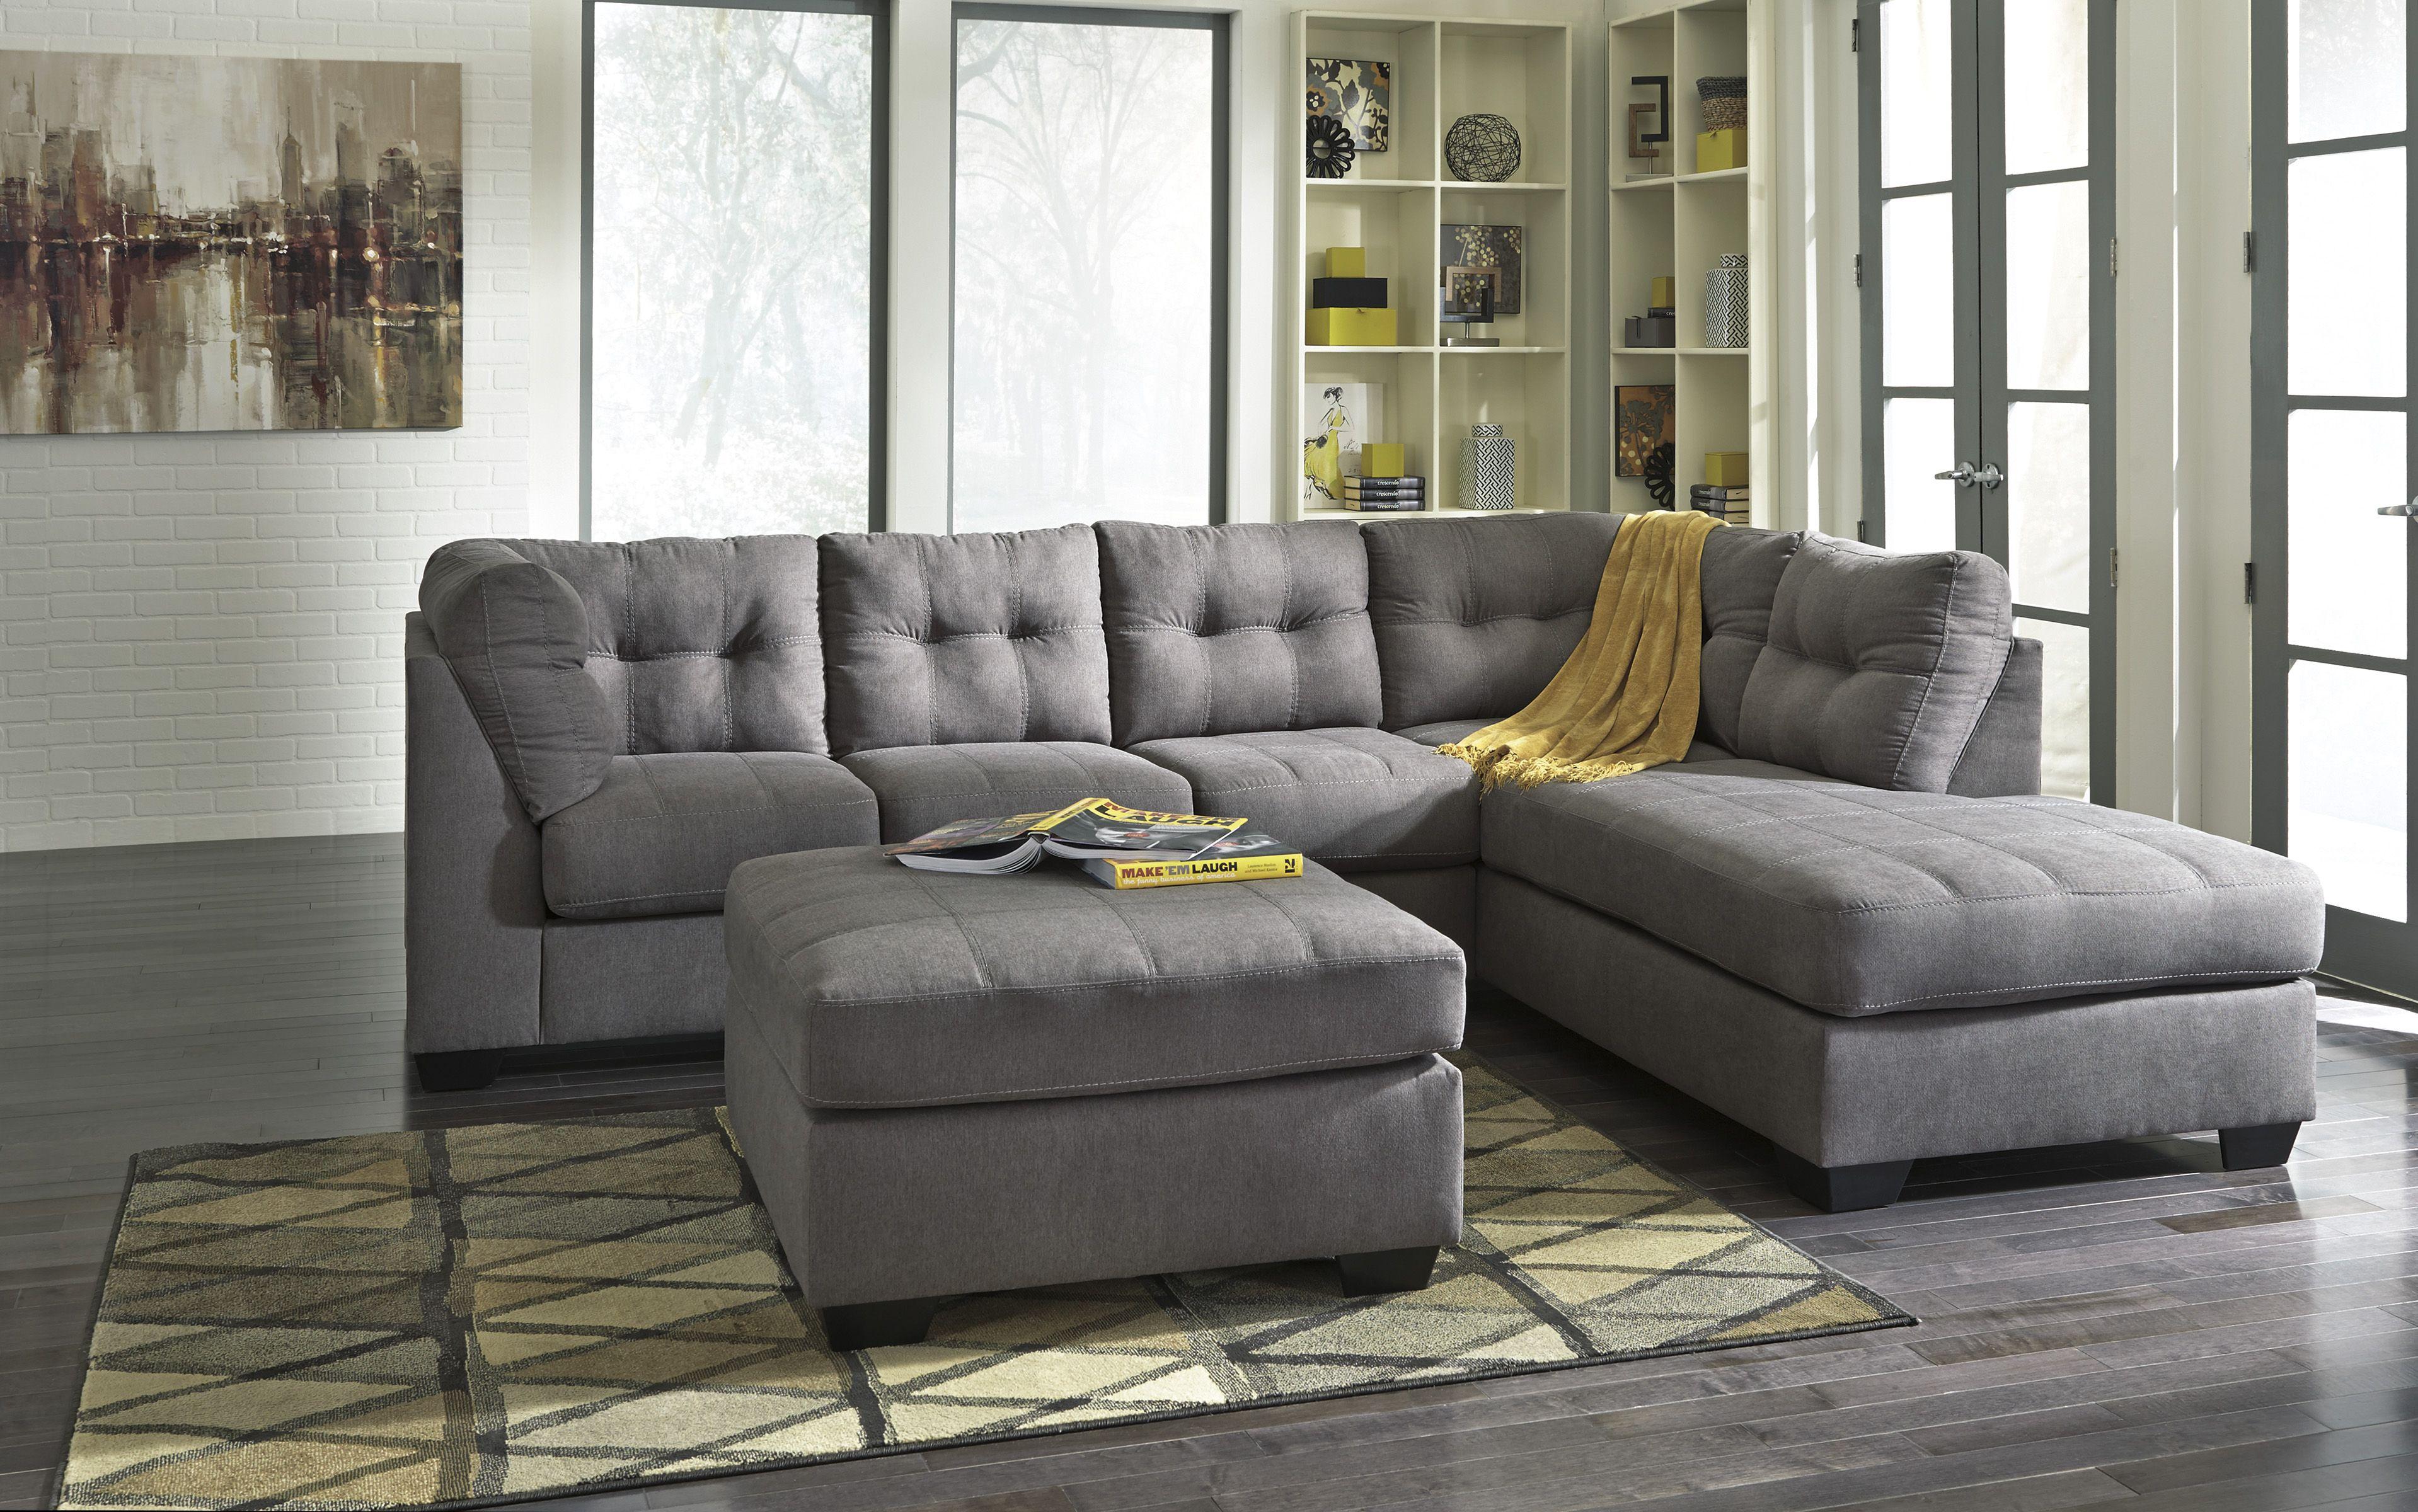 Sectional Sofas In Las Vegas Nv Poliform Tribeca Sofa Preis Signature Designs Living Room Two Piece Walker